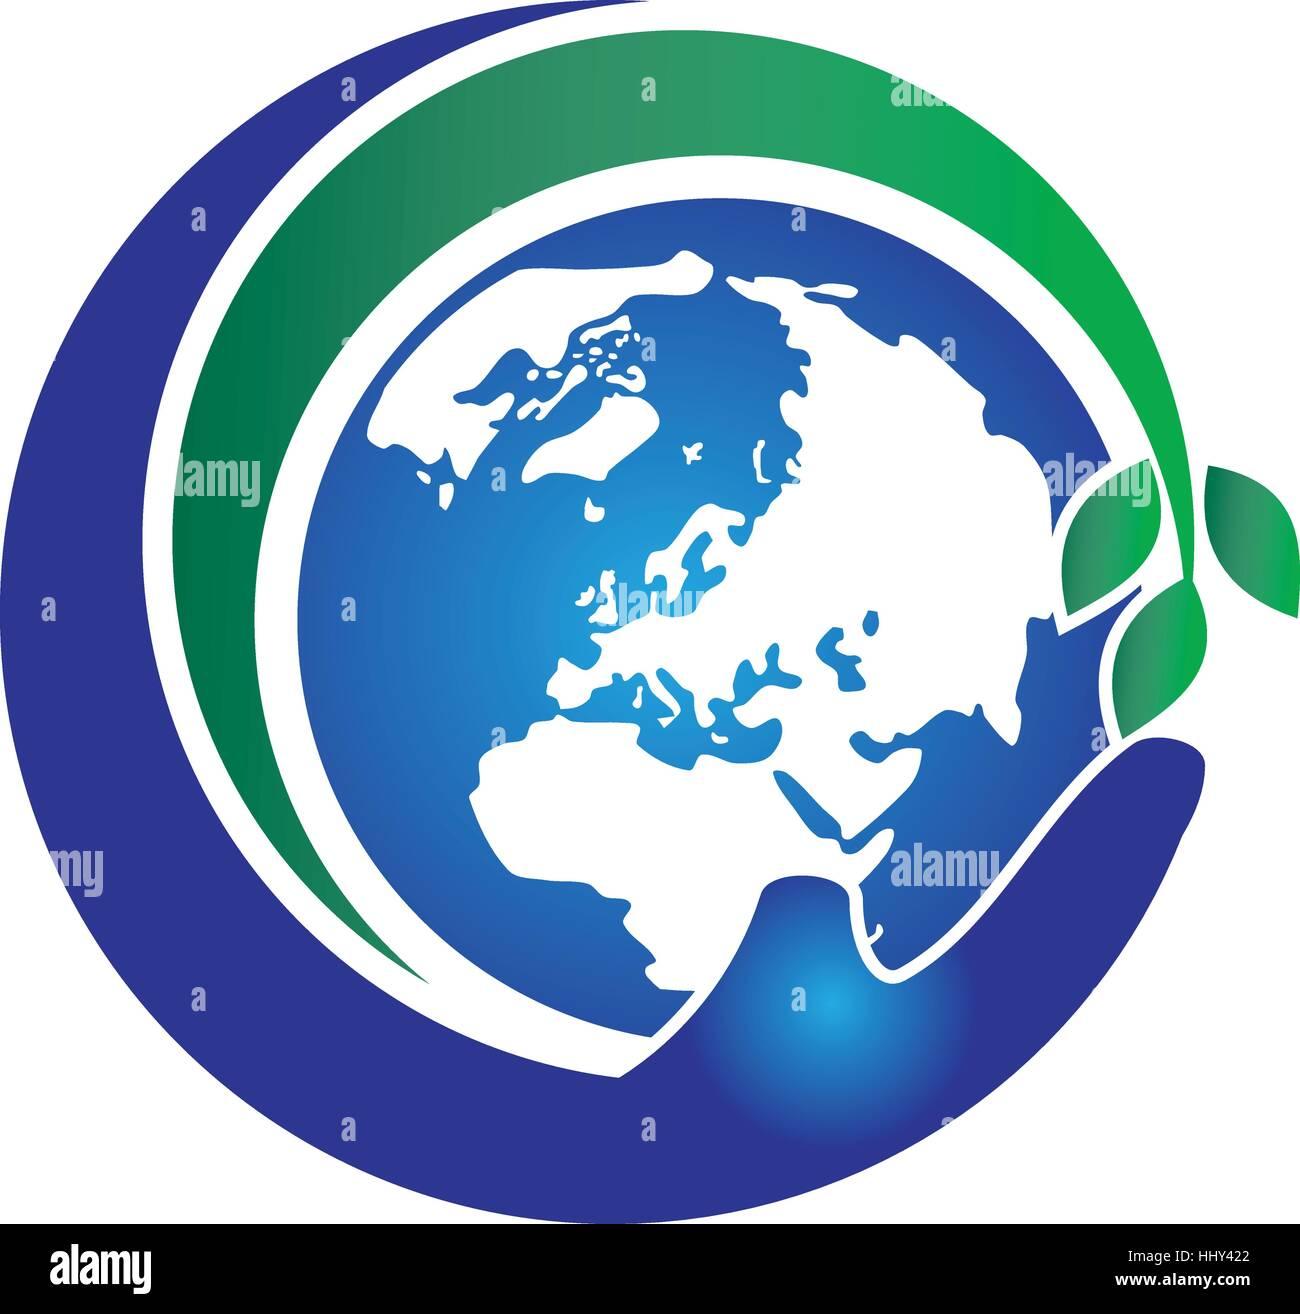 Global Farm and Garden Solution - Stock Vector